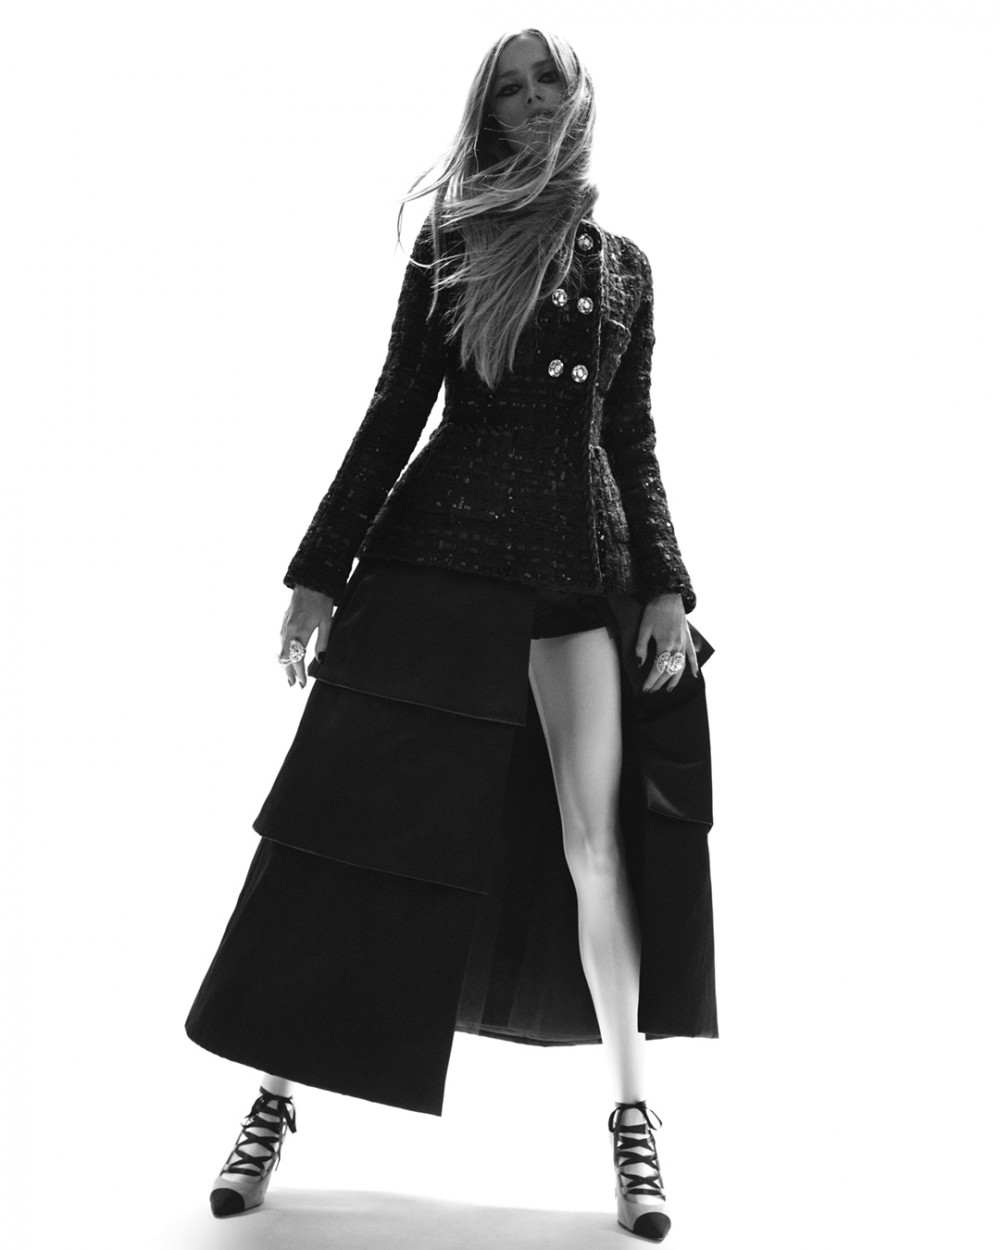 CHANEL叛逆浪漫的高級訂製系列!Virginie Viard將會怎樣顛覆品牌的形象?